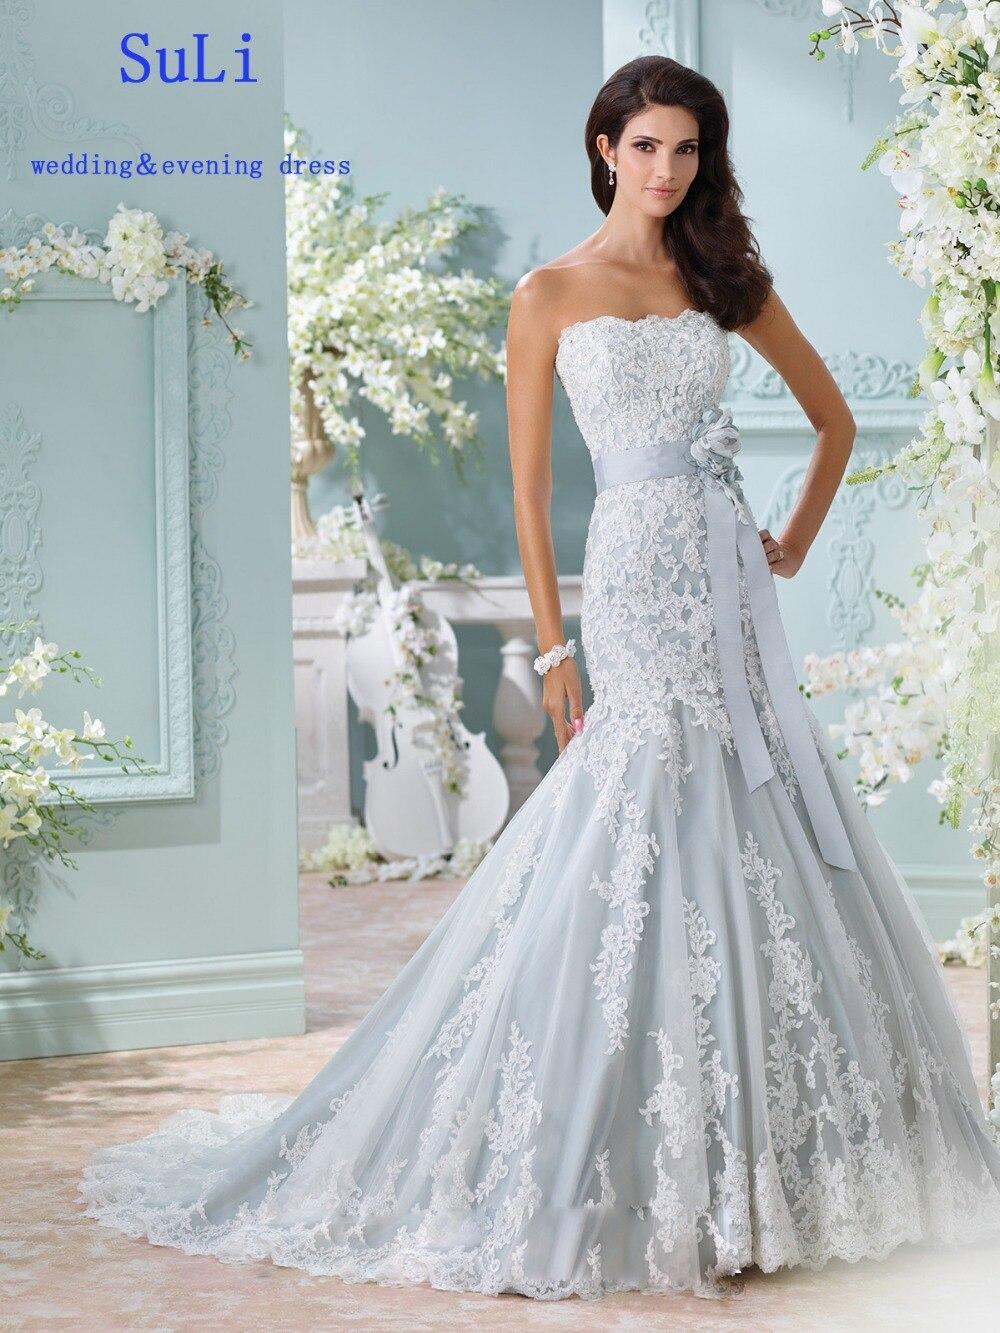 Amazing Wedding Dresses With Veils Photos - All Wedding Dresses ...